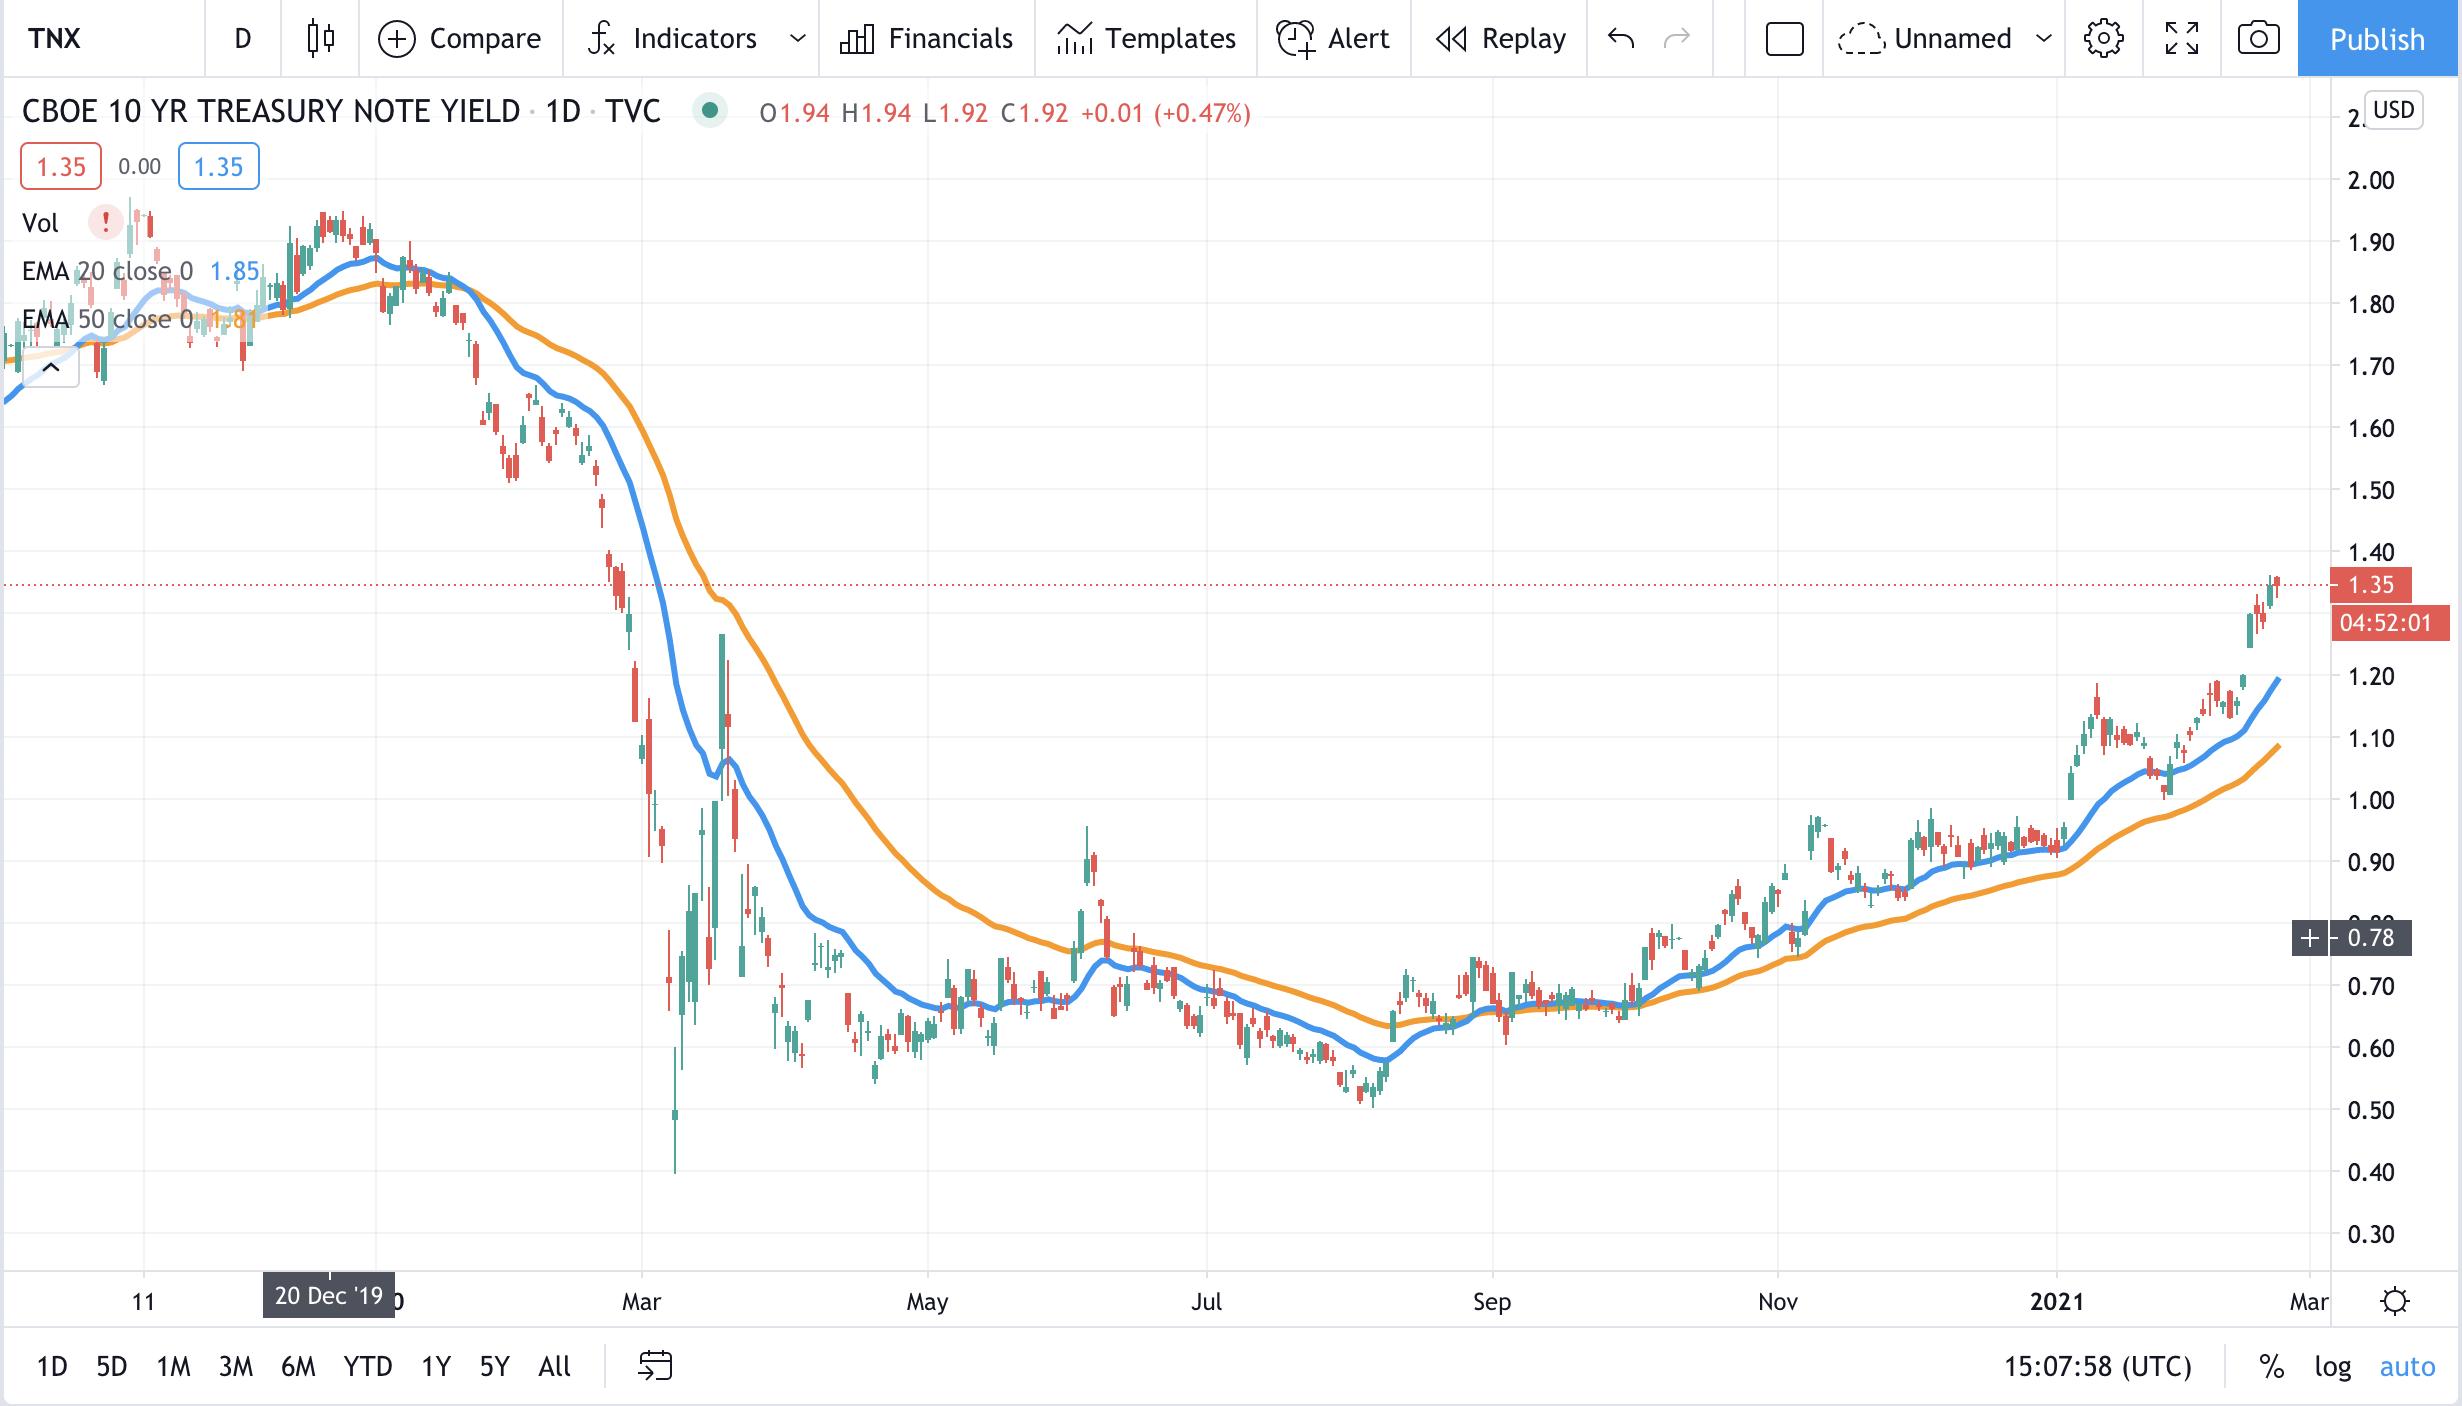 TNX CBOE 10 Year Treasury Yield